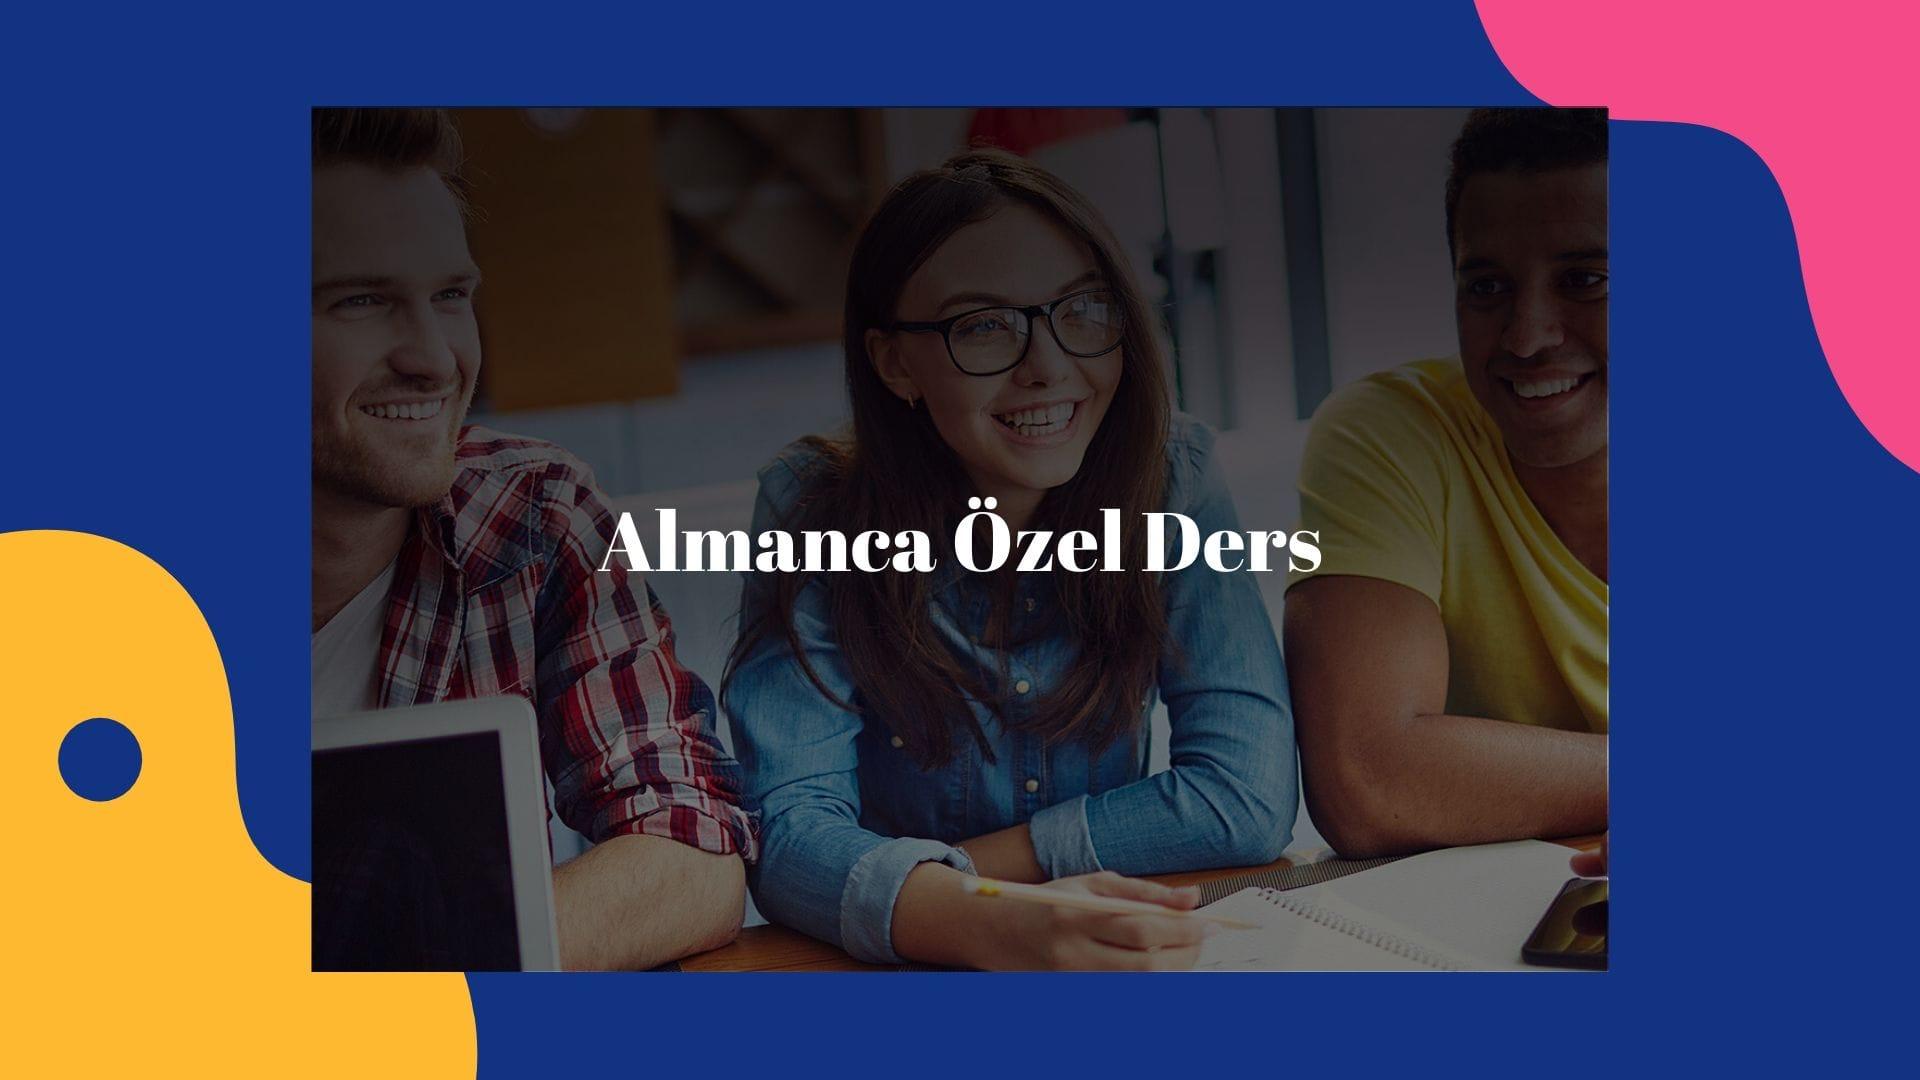 Almanca Özel Ders